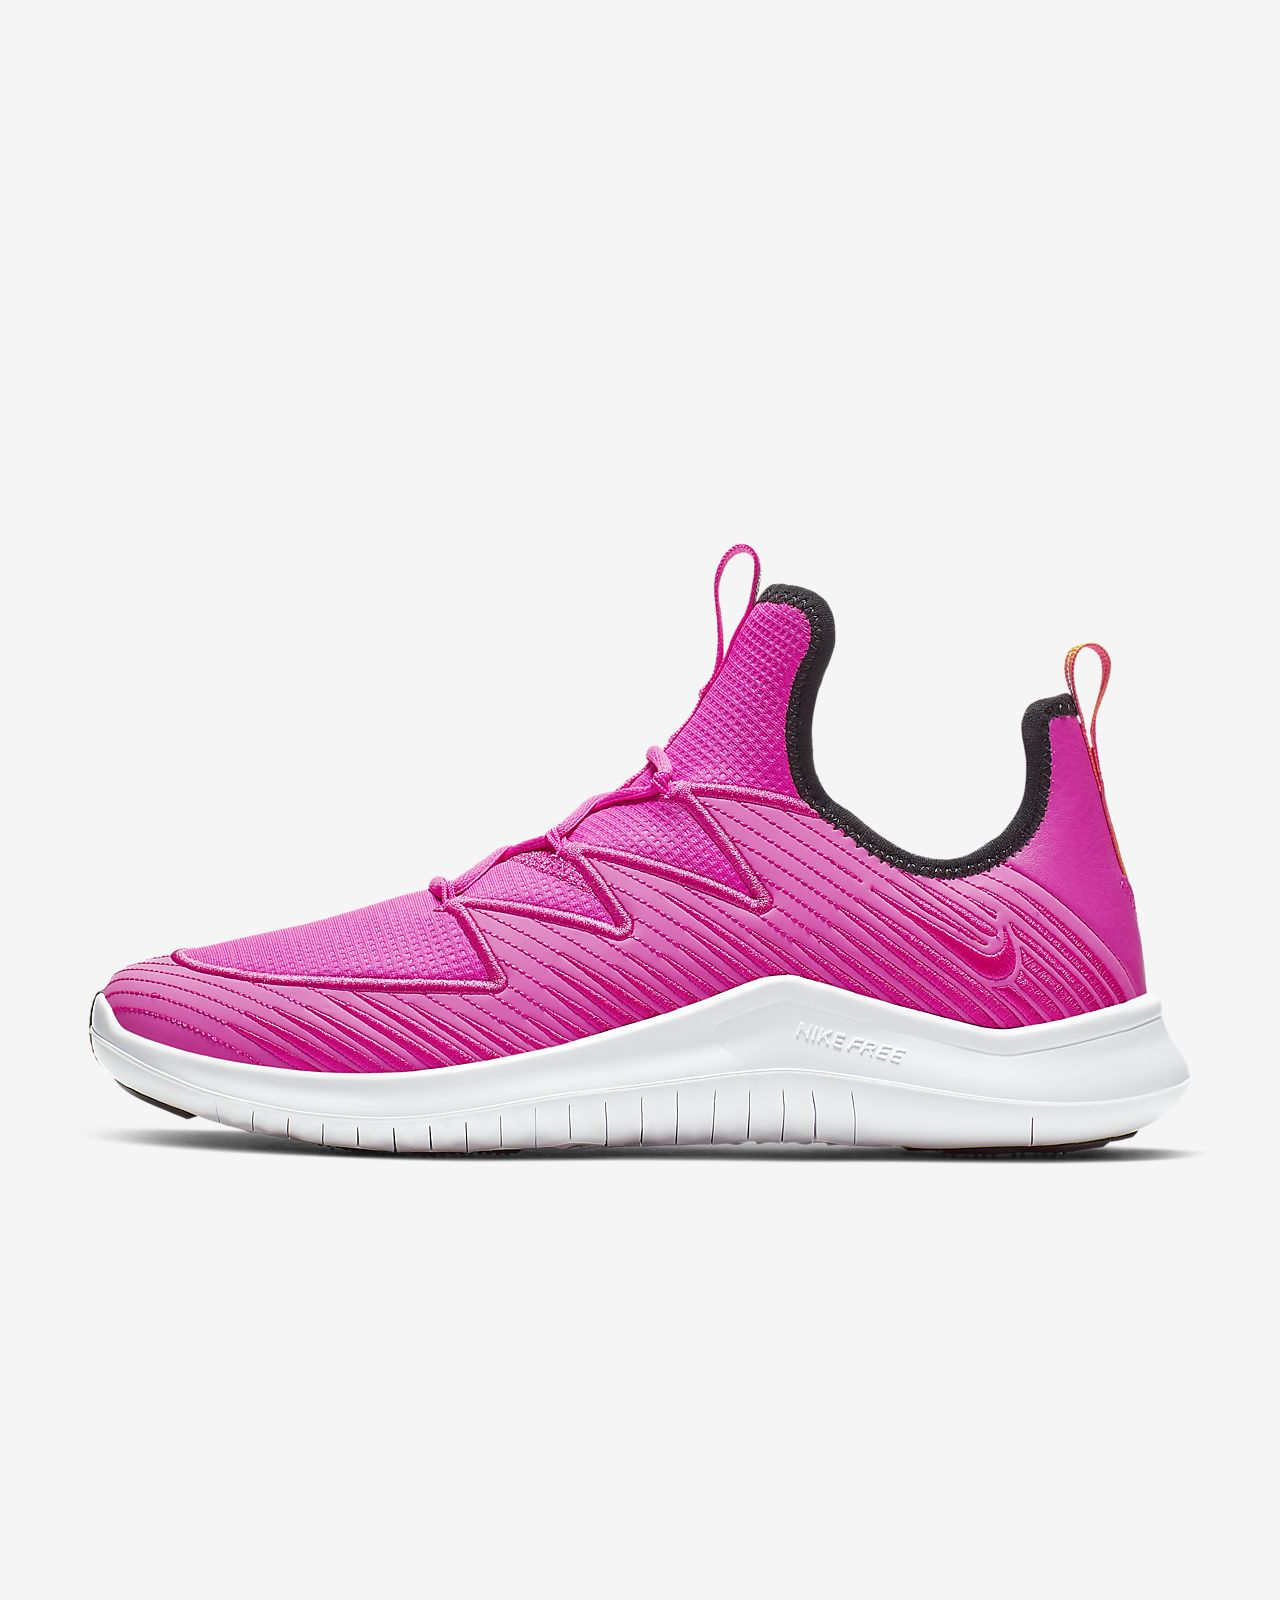 hot sale online a5018 bc765 ... Chaussure de training Nike Free TR Ultra pour Femme